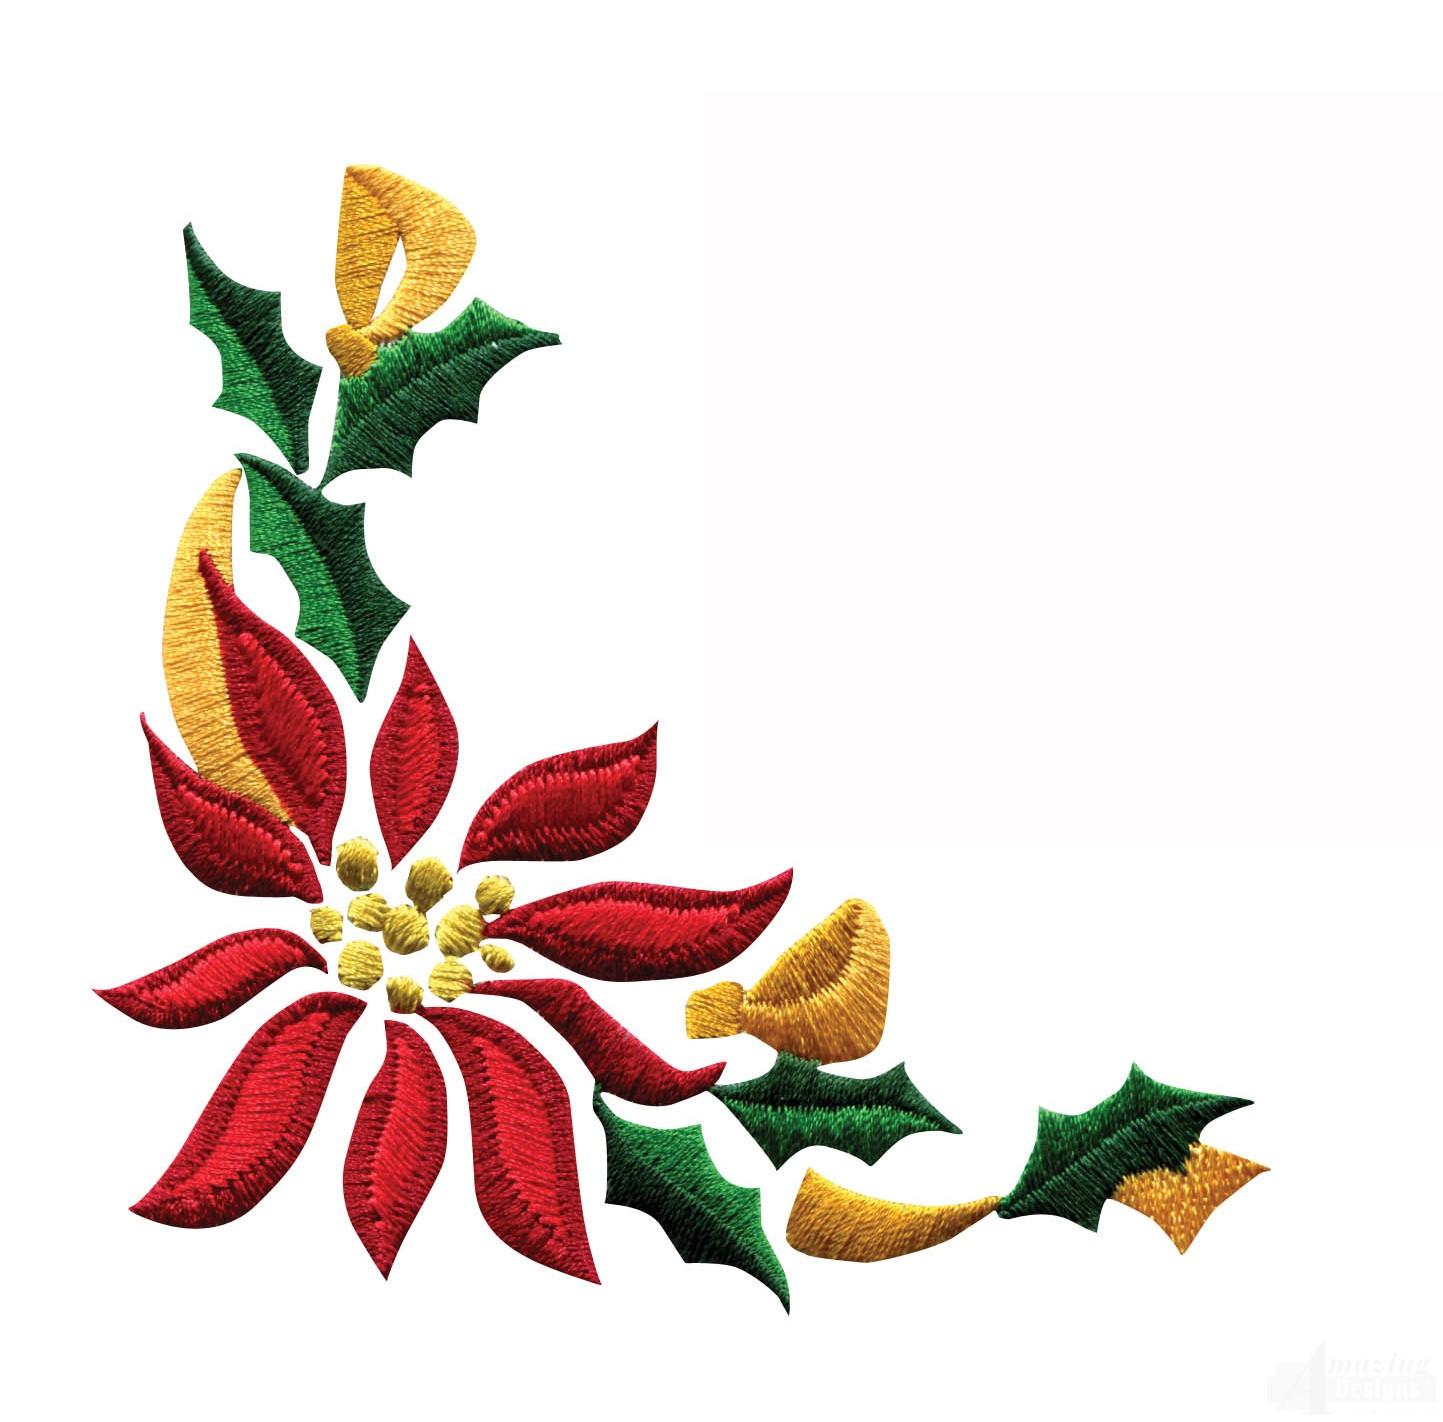 Poinsettia Border Clip Art